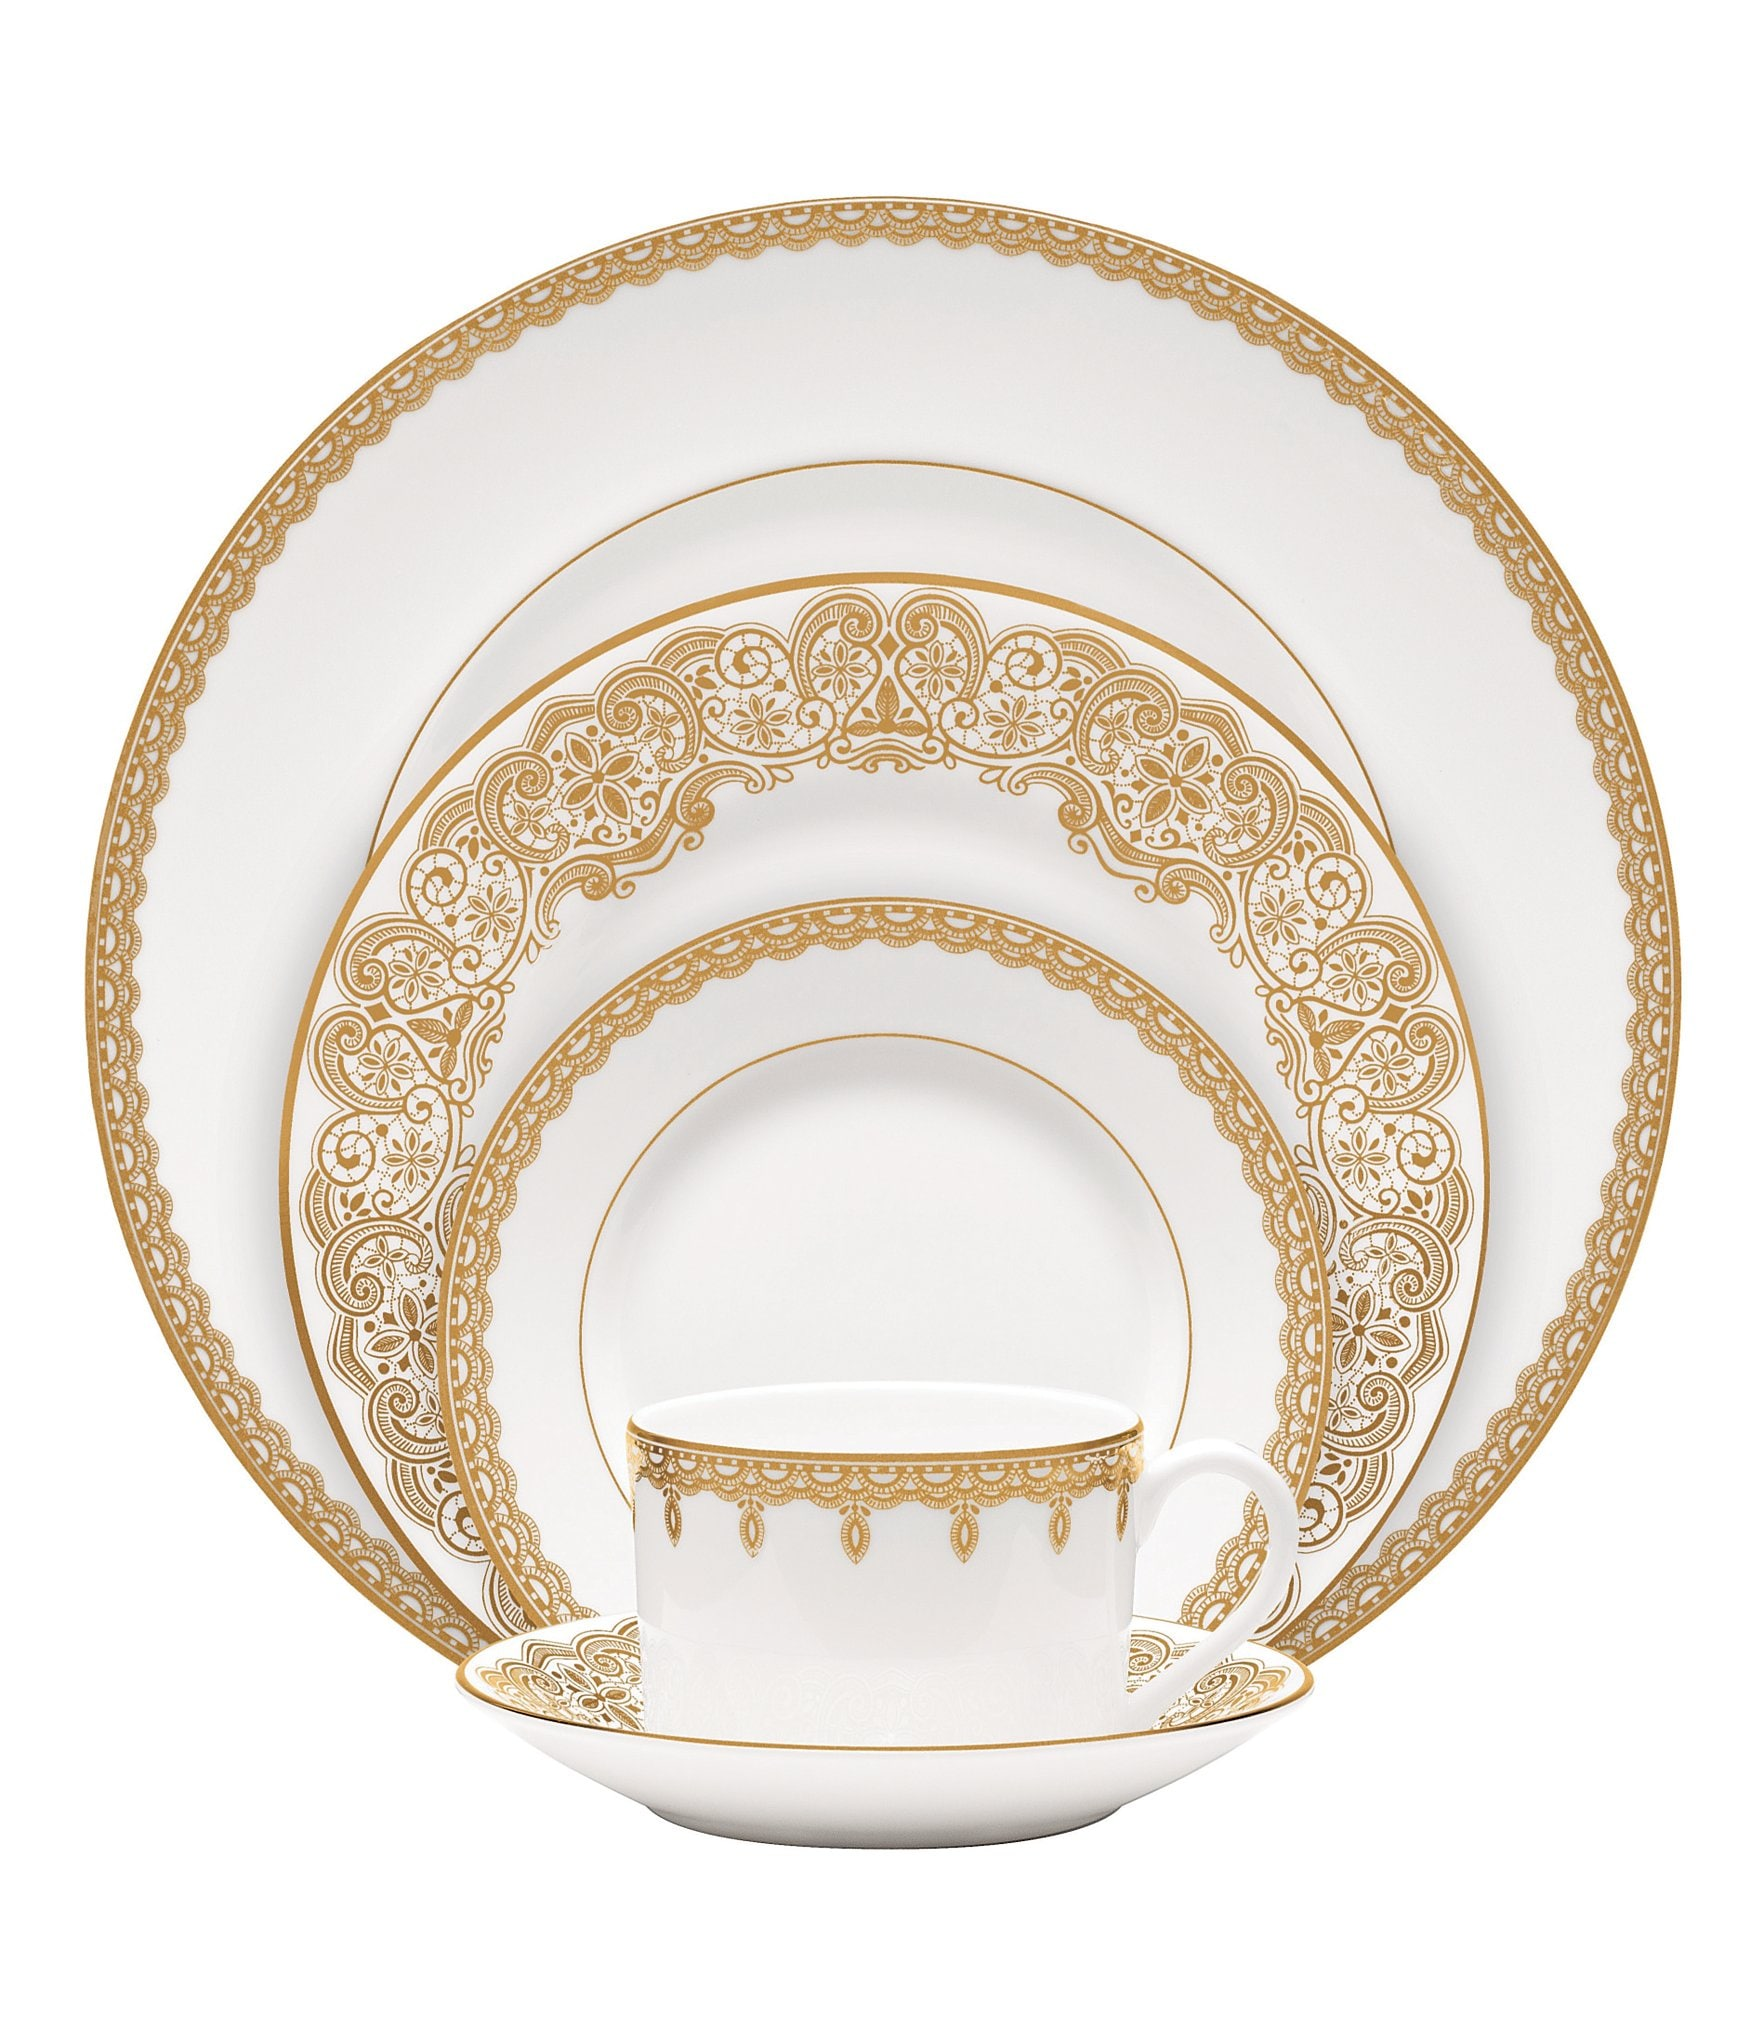 sc 1 st  Dillardu0027s & Dining u0026 Hosting: Dinnerware Glassware u0026 Serveware | Dillards